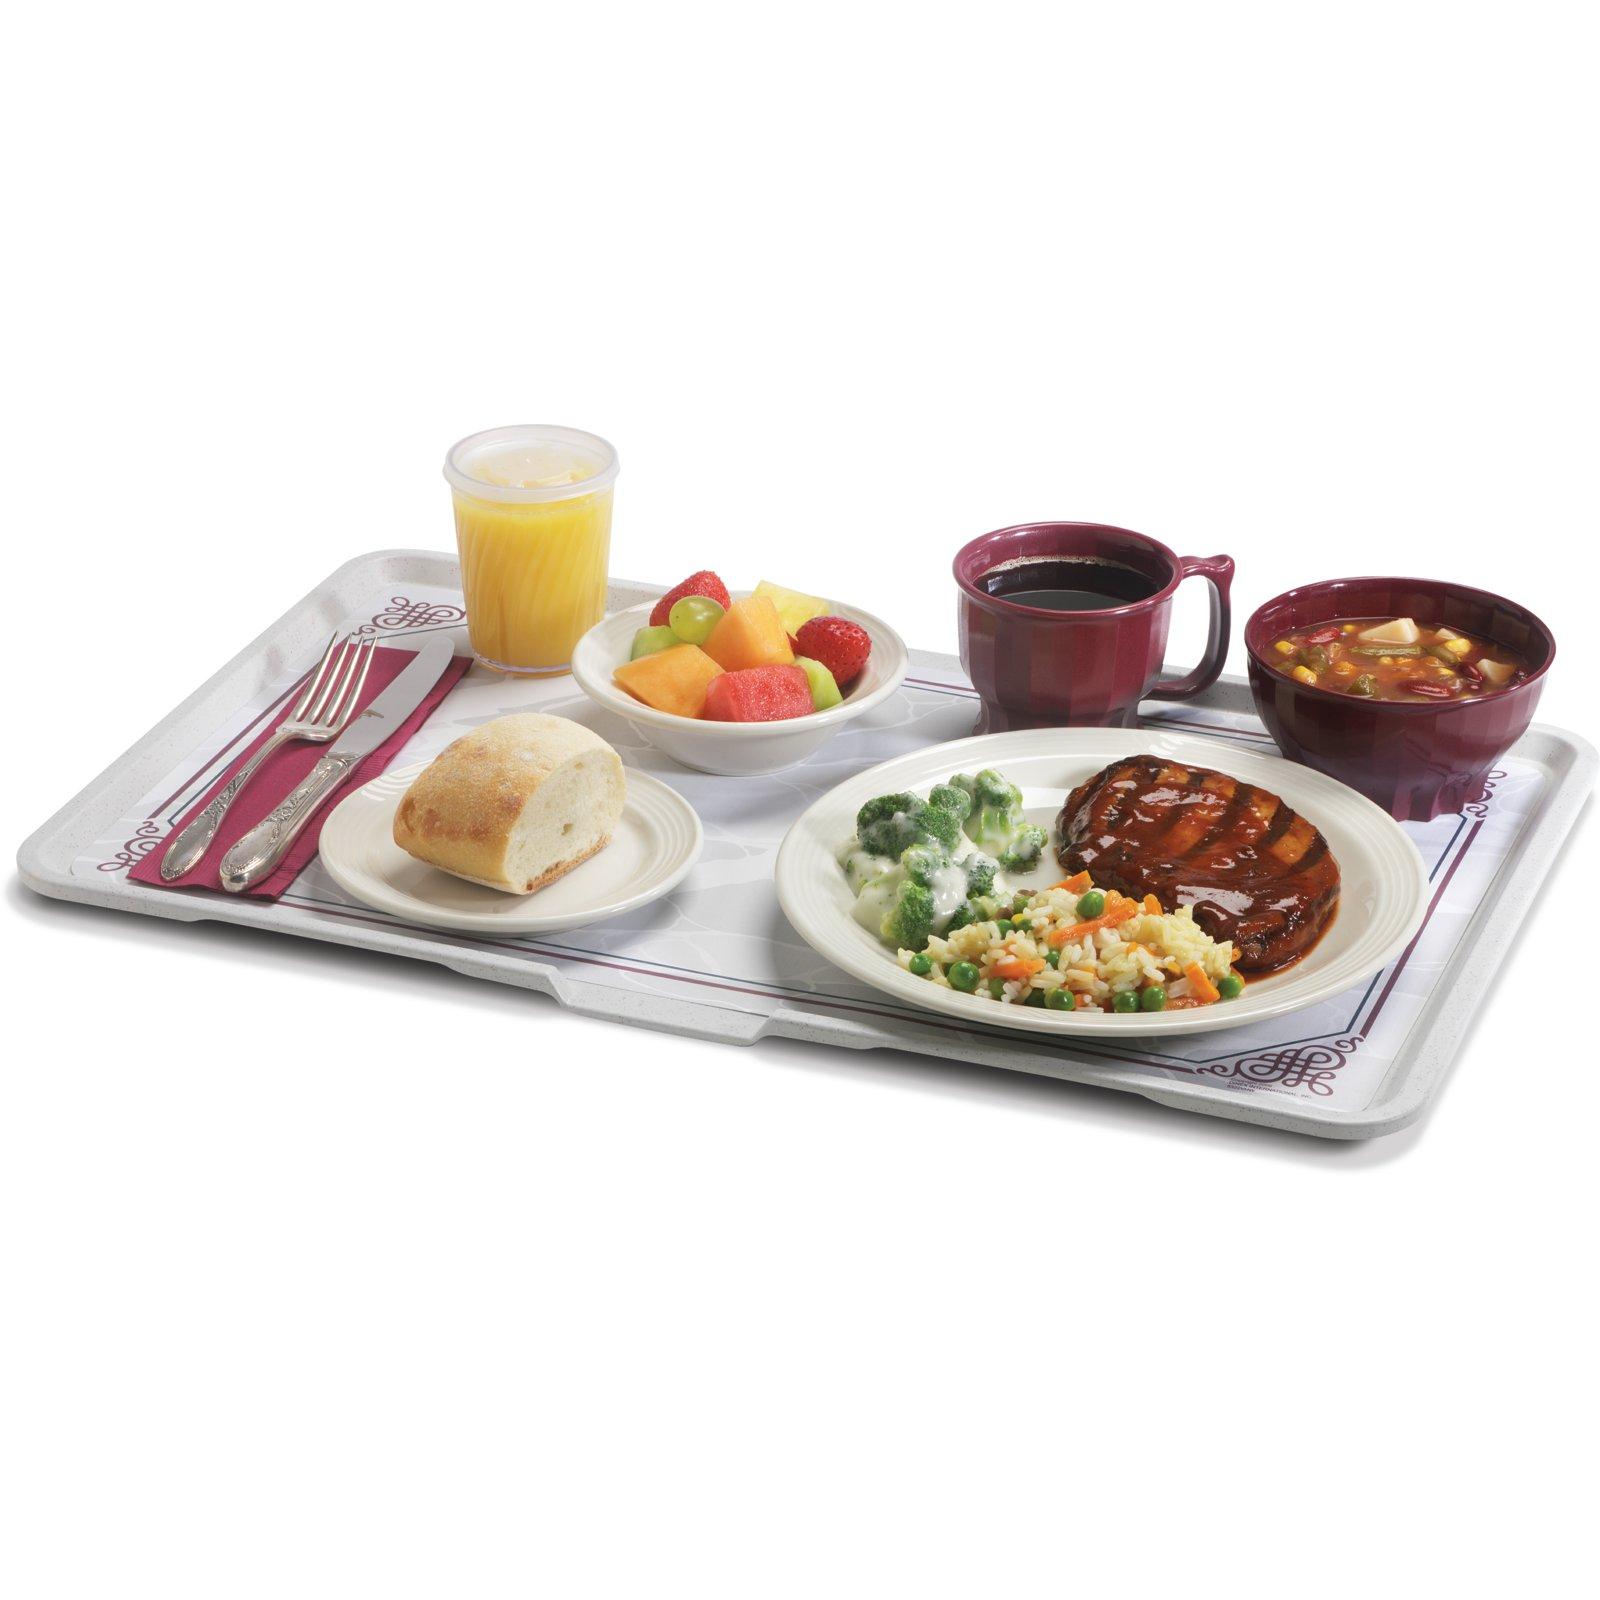 Dinex Food Service